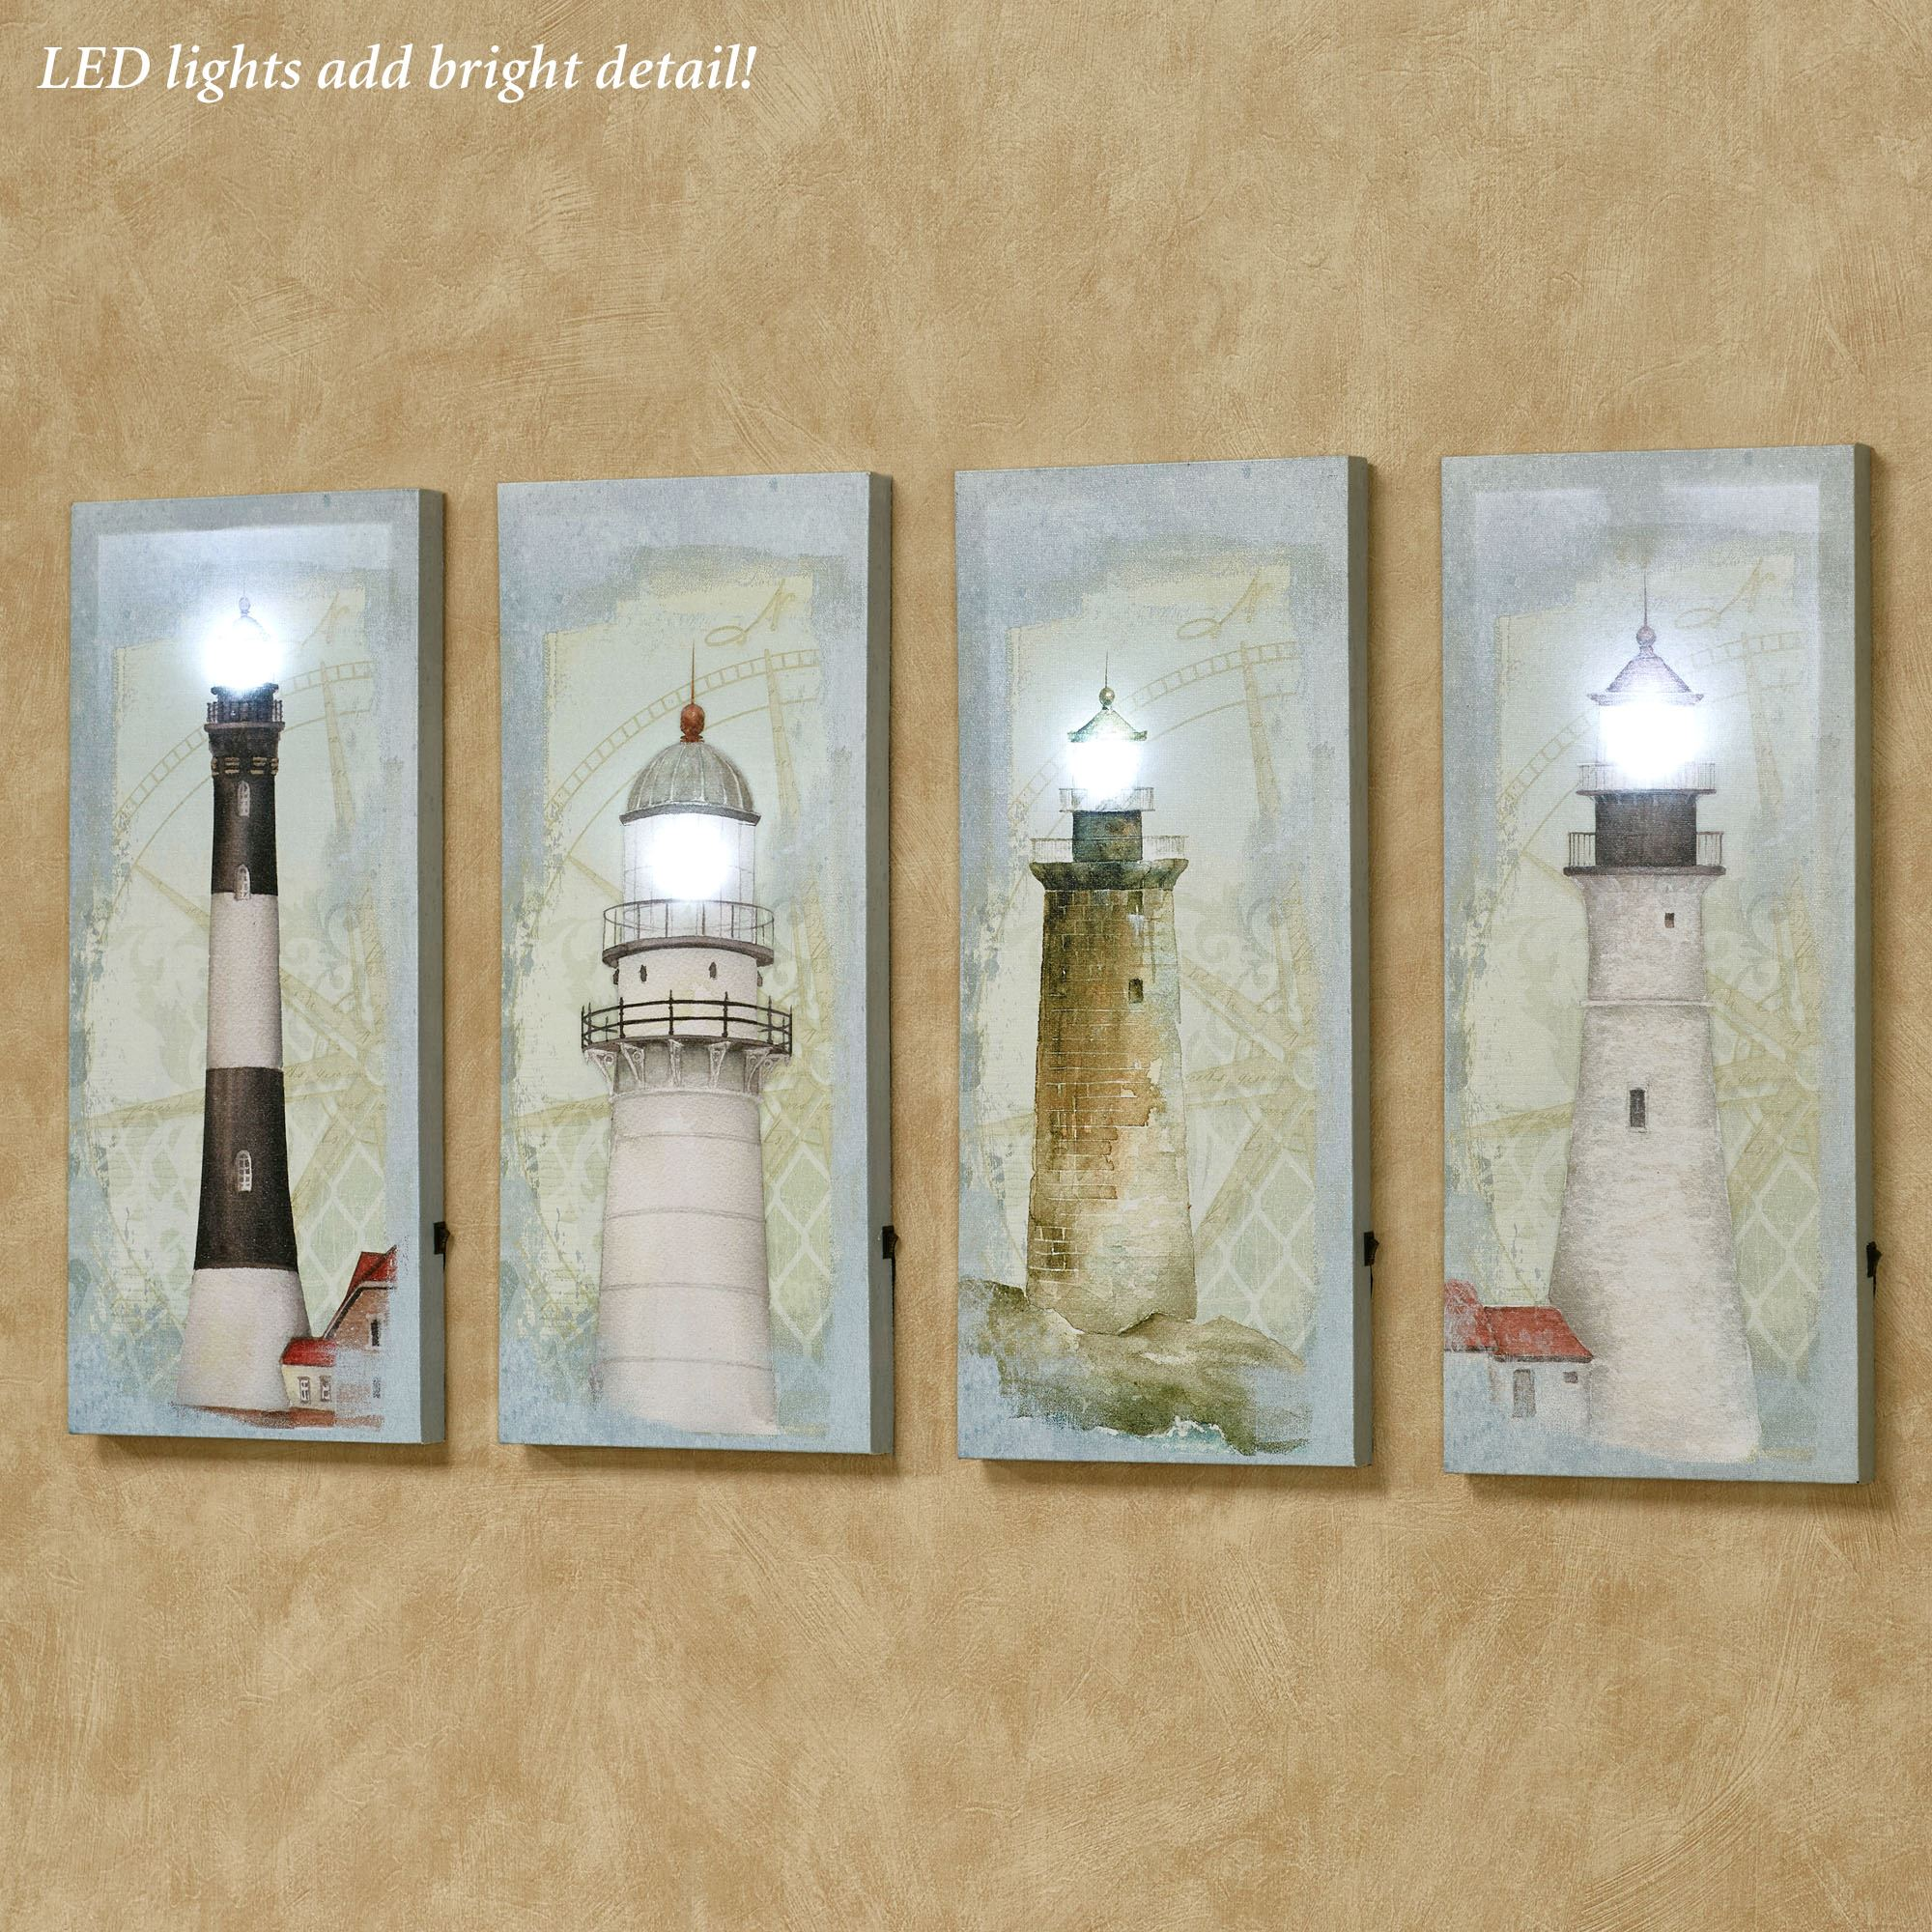 Excellent Coastal Lighthouse LED Lighted Canvas Wall Art Set SG86